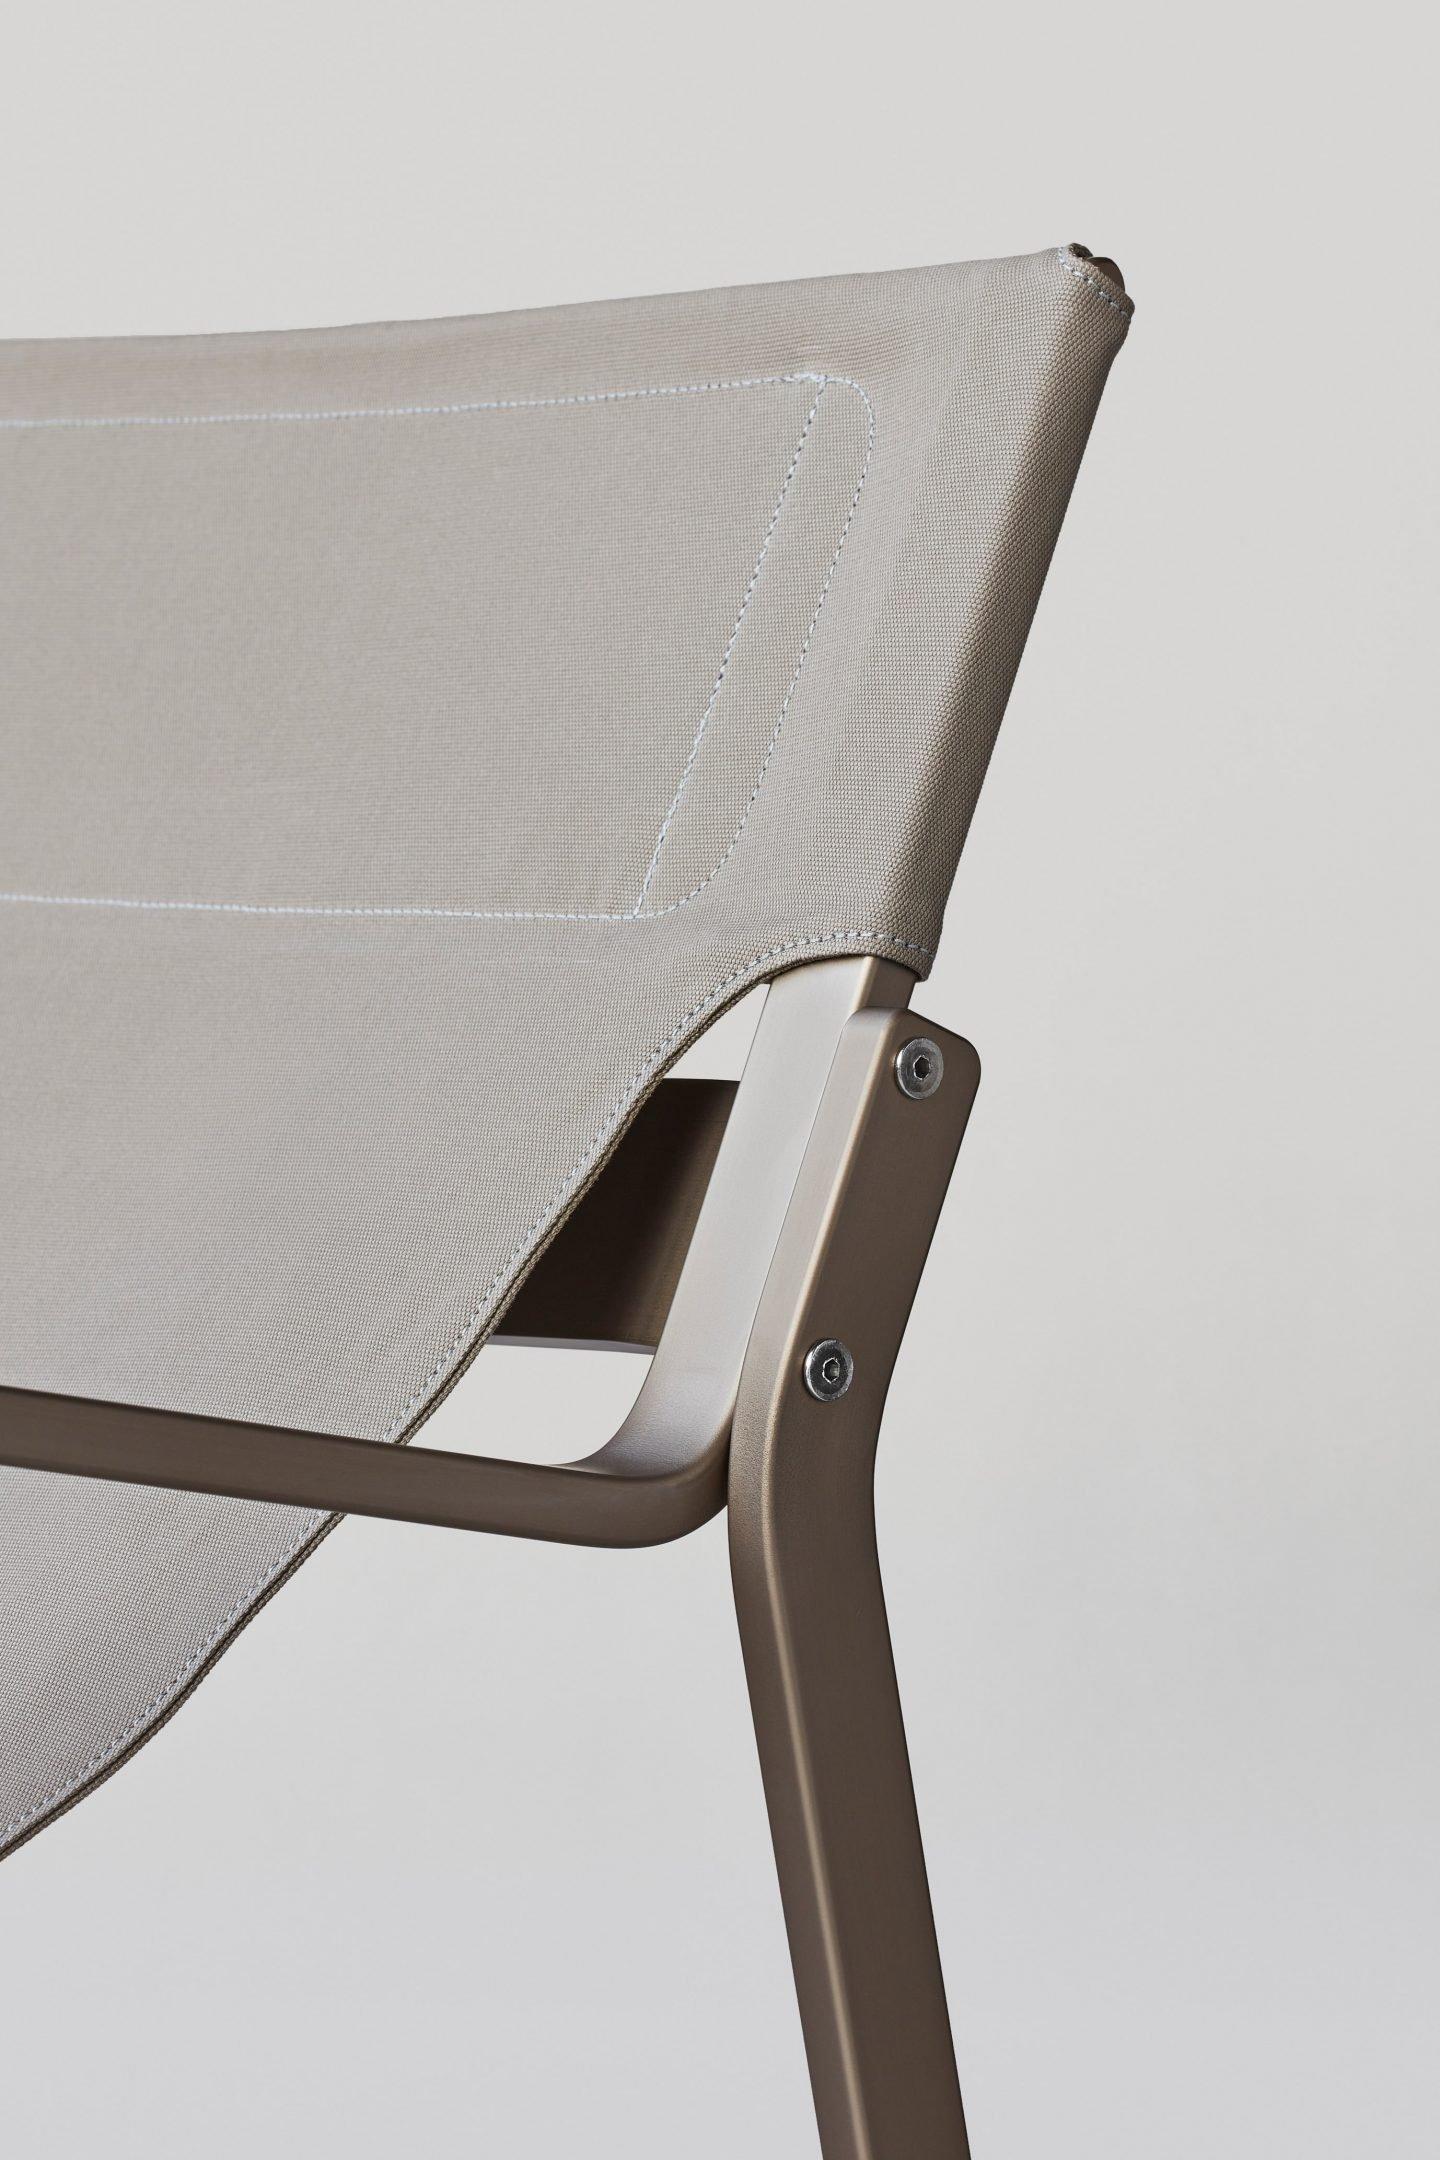 IGNANT-Design-Furniture-EnsoChair-3